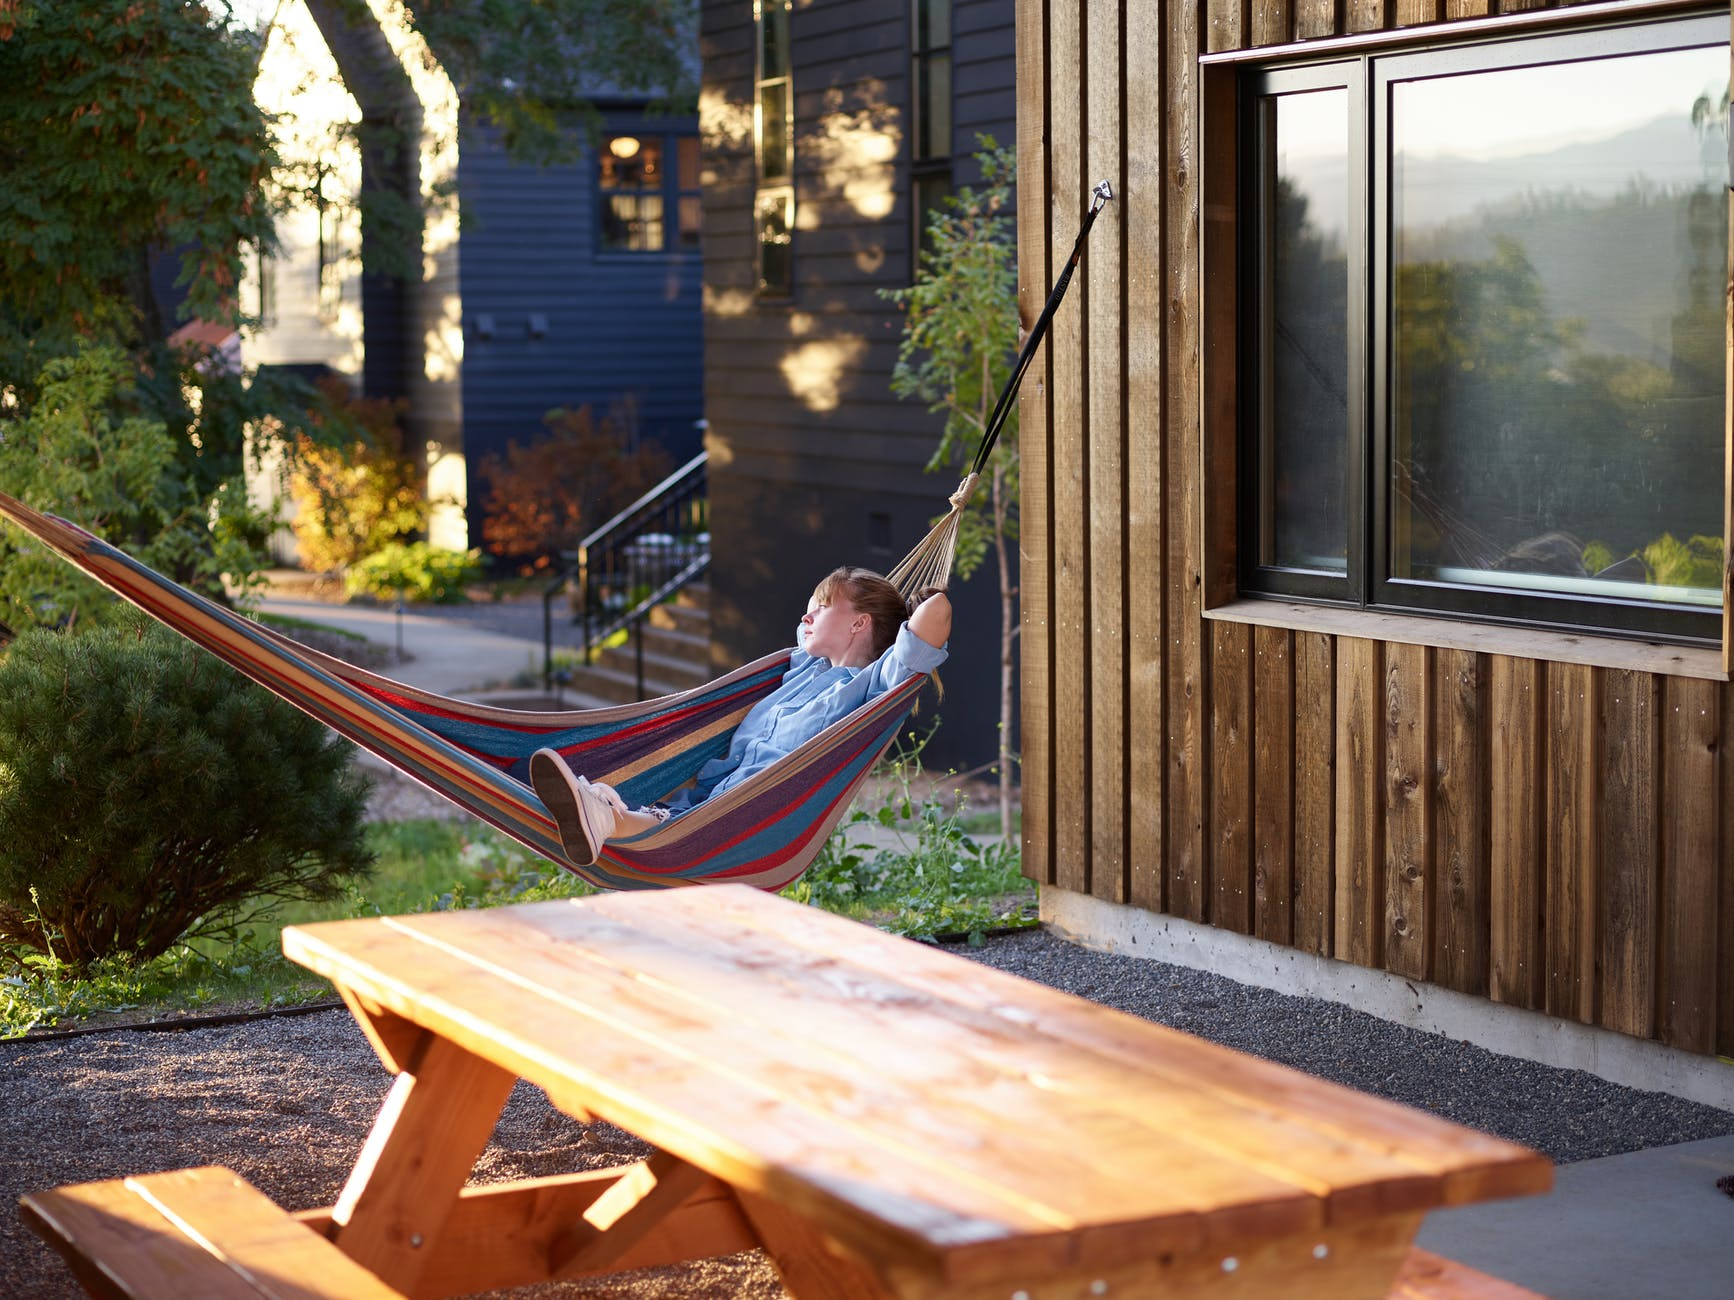 relaxed woman having nap in hammock